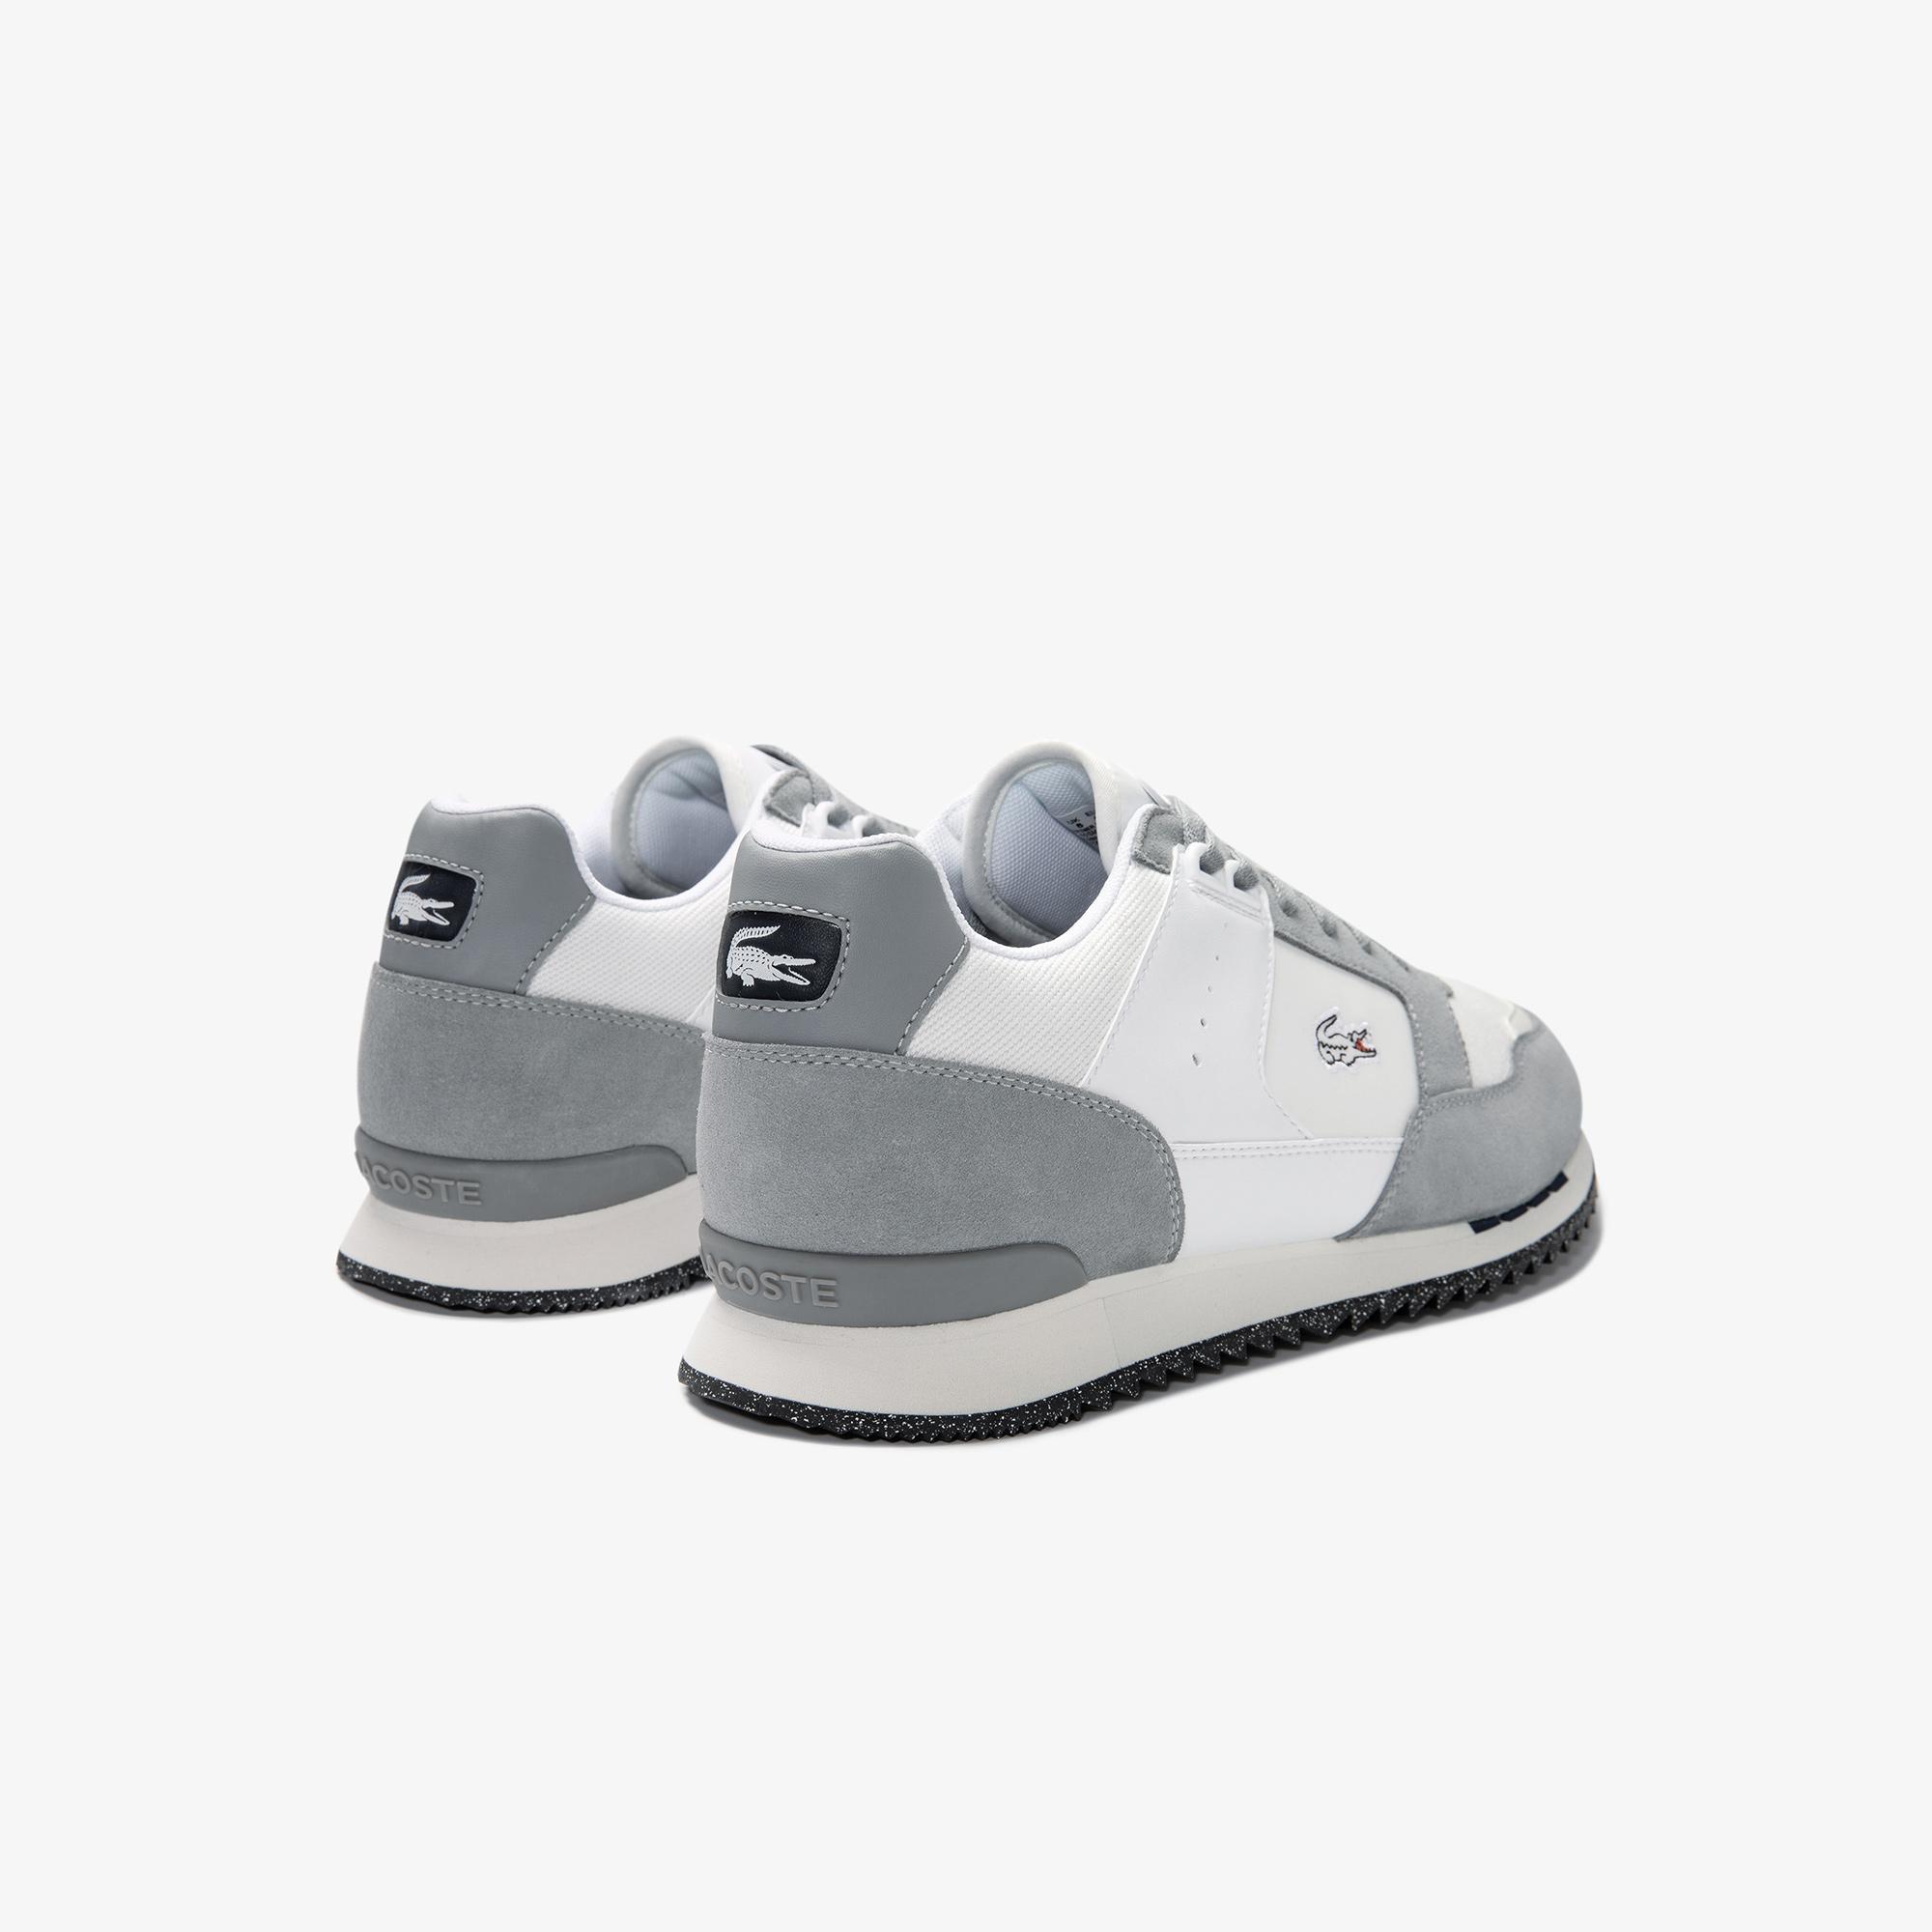 Lacoste Partner Piste 01202 Sma Erkek Gri - Beyaz Sneaker